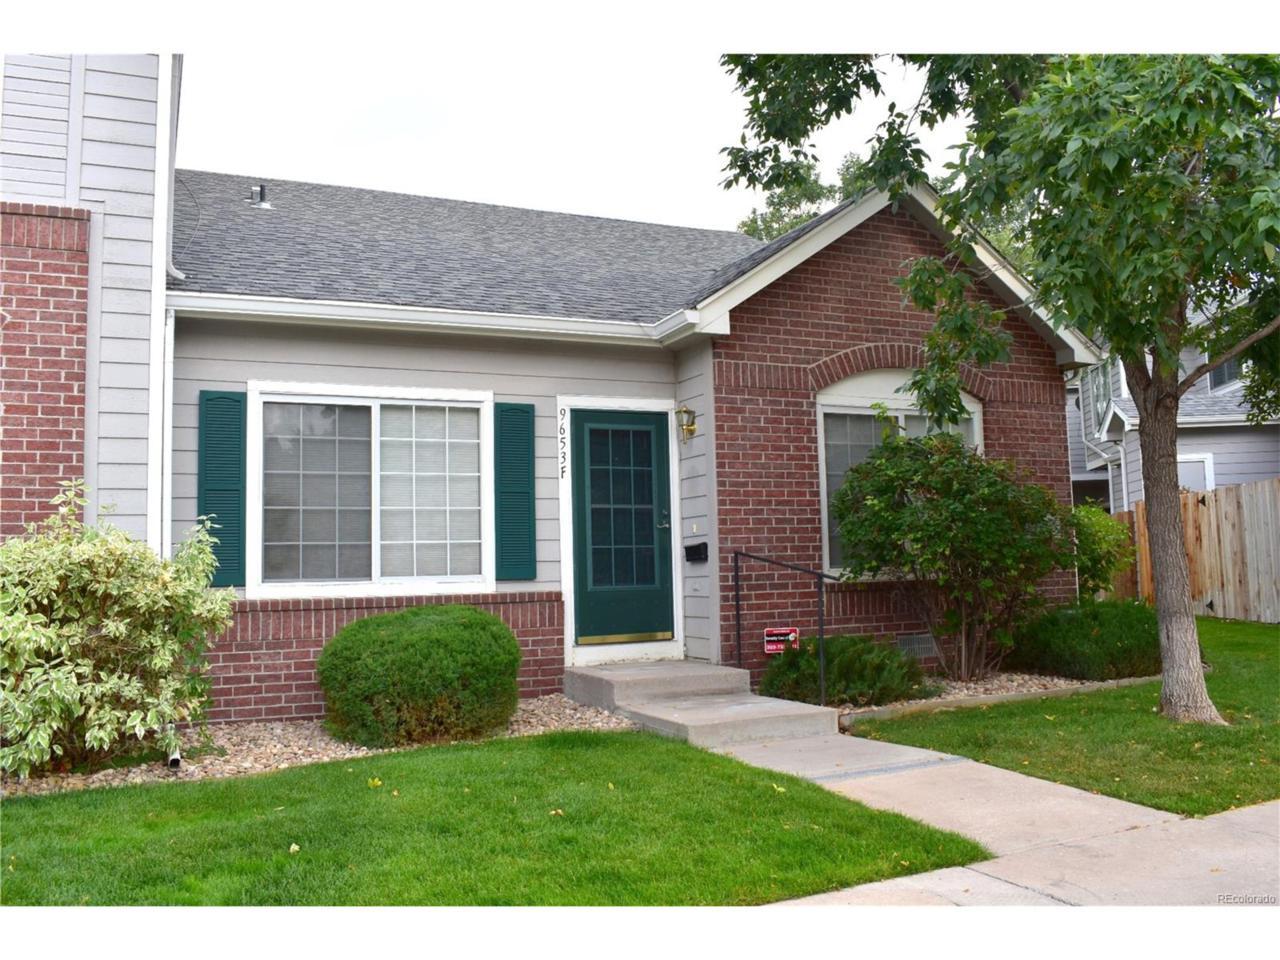 9653 W Chatfield Avenue F, Littleton, CO 80128 (MLS #7880771) :: 8z Real Estate